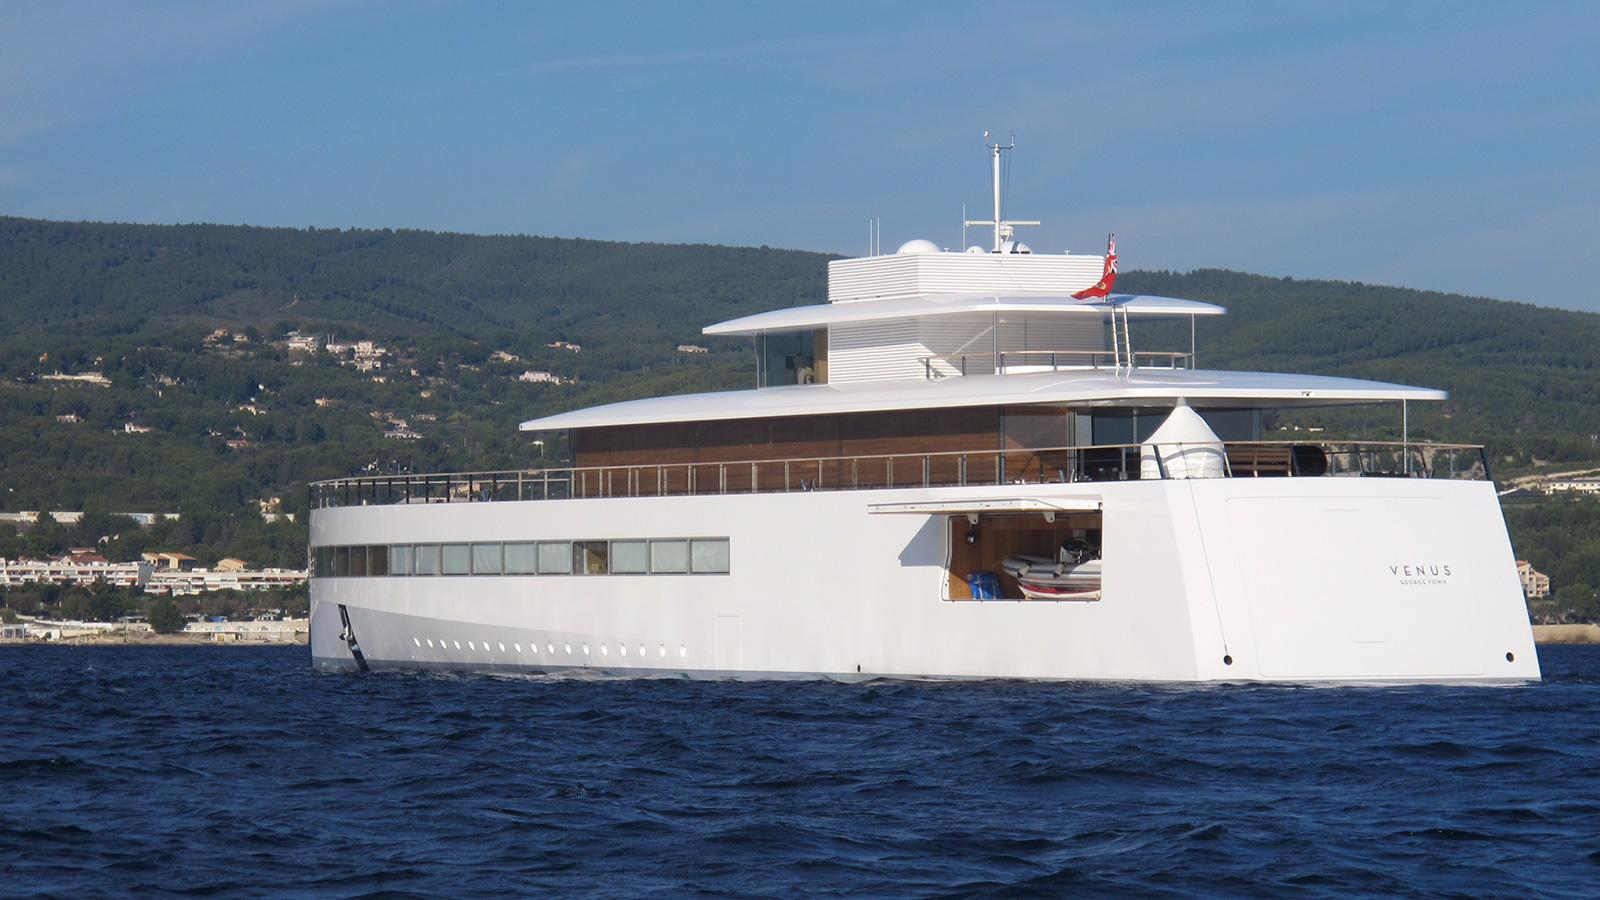 steve jobs Inside Steve Jobs' Luxury Yacht 46k6SMYXRuSTnryMez2h venus yacht tender garage